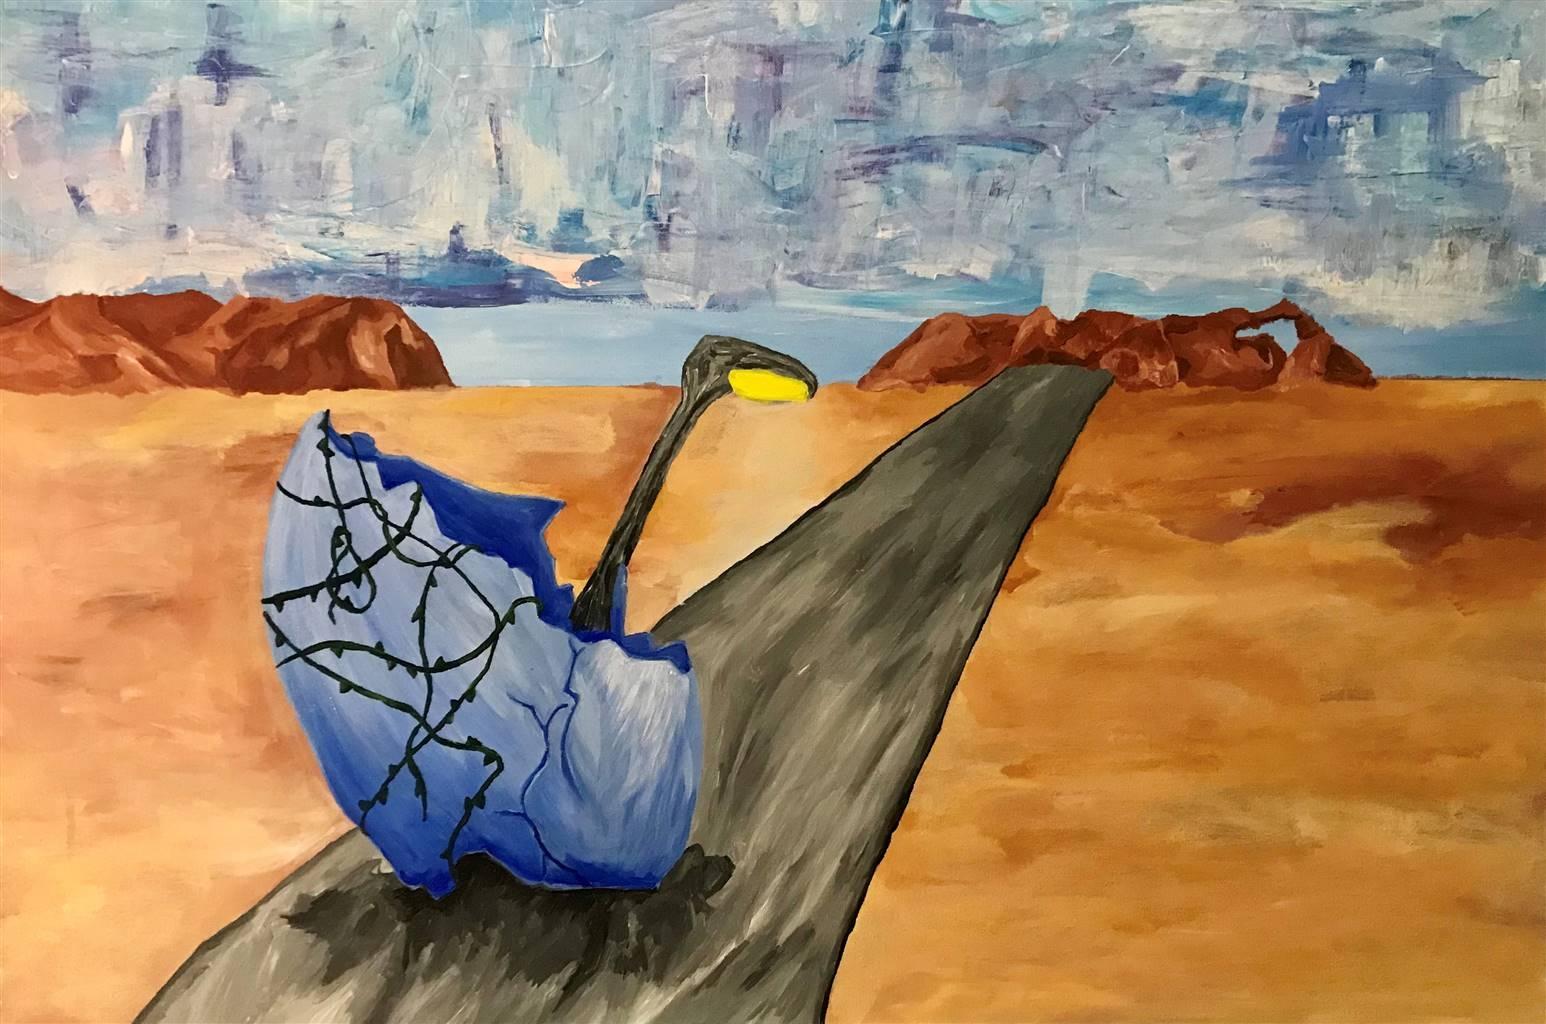 Ethan Lam, Boundary Lit, Acrylic on Canvas, 24'' x 36'' image